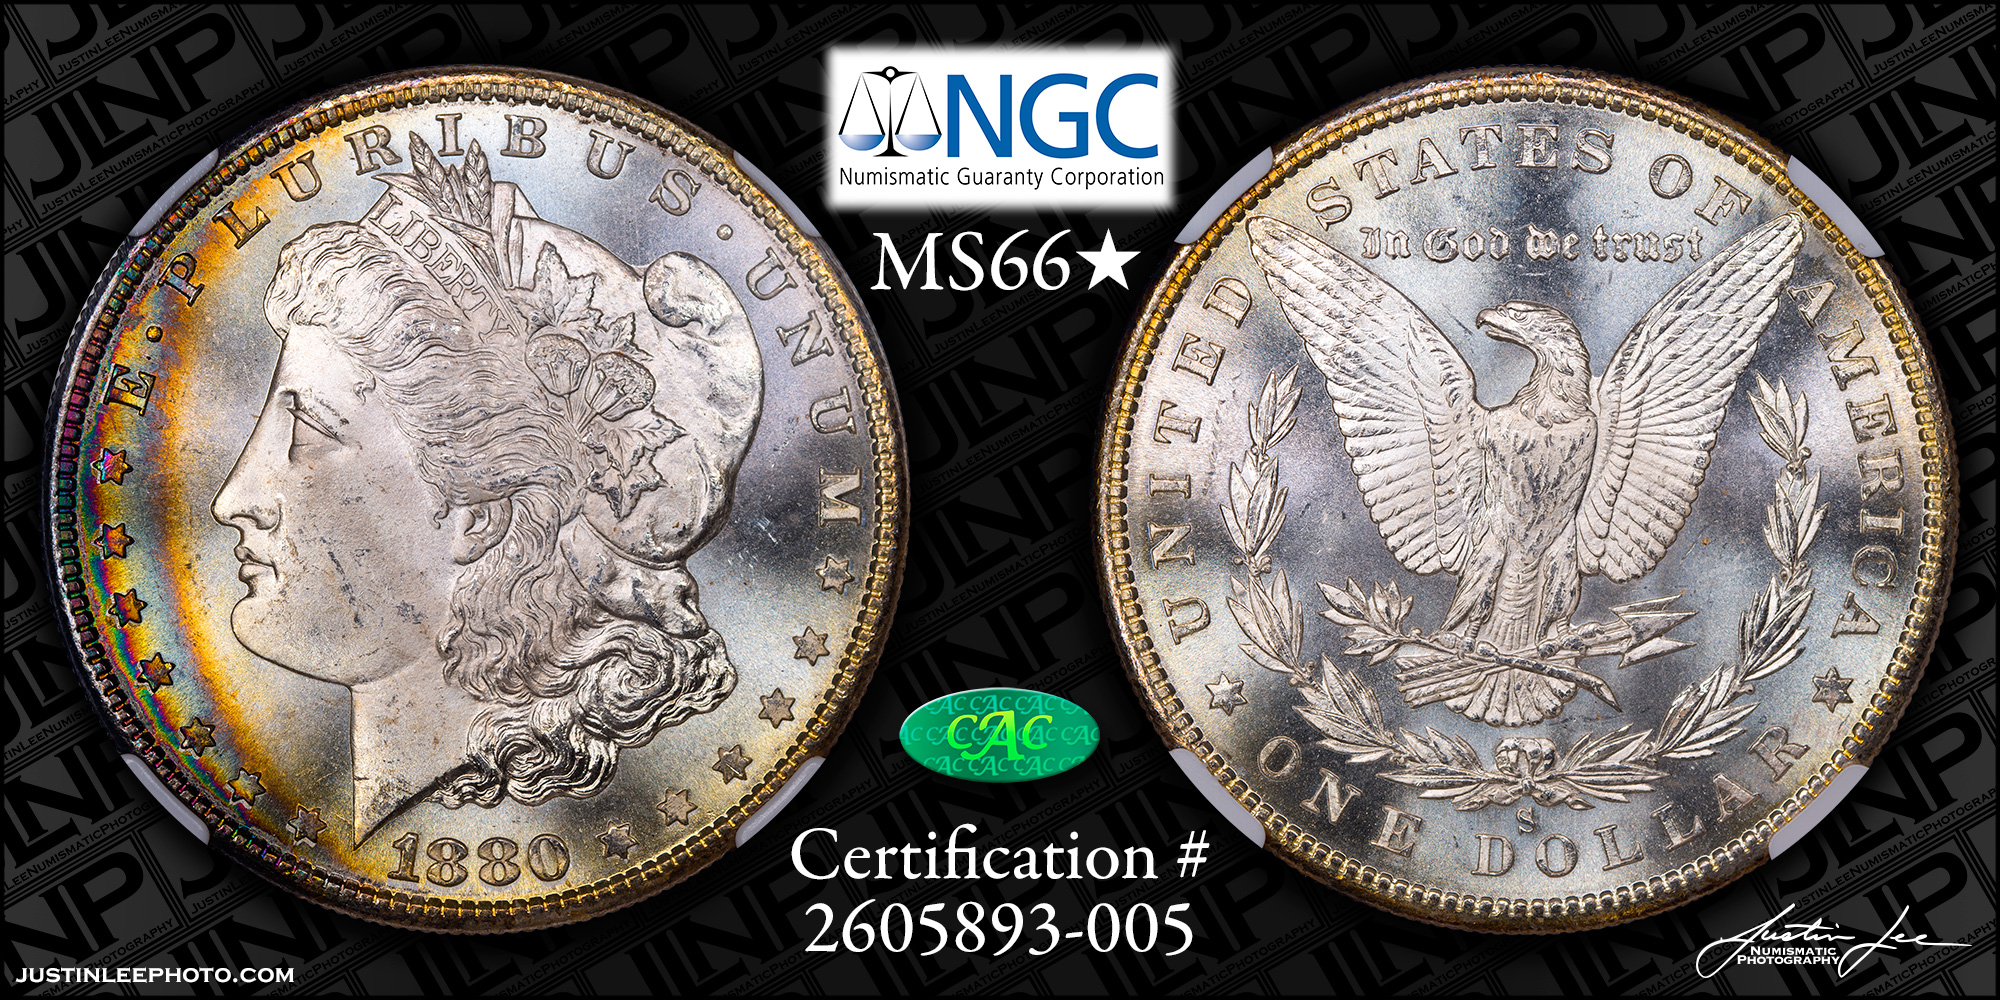 1880-S Morgan Dollar NGC MS66 Star CAC